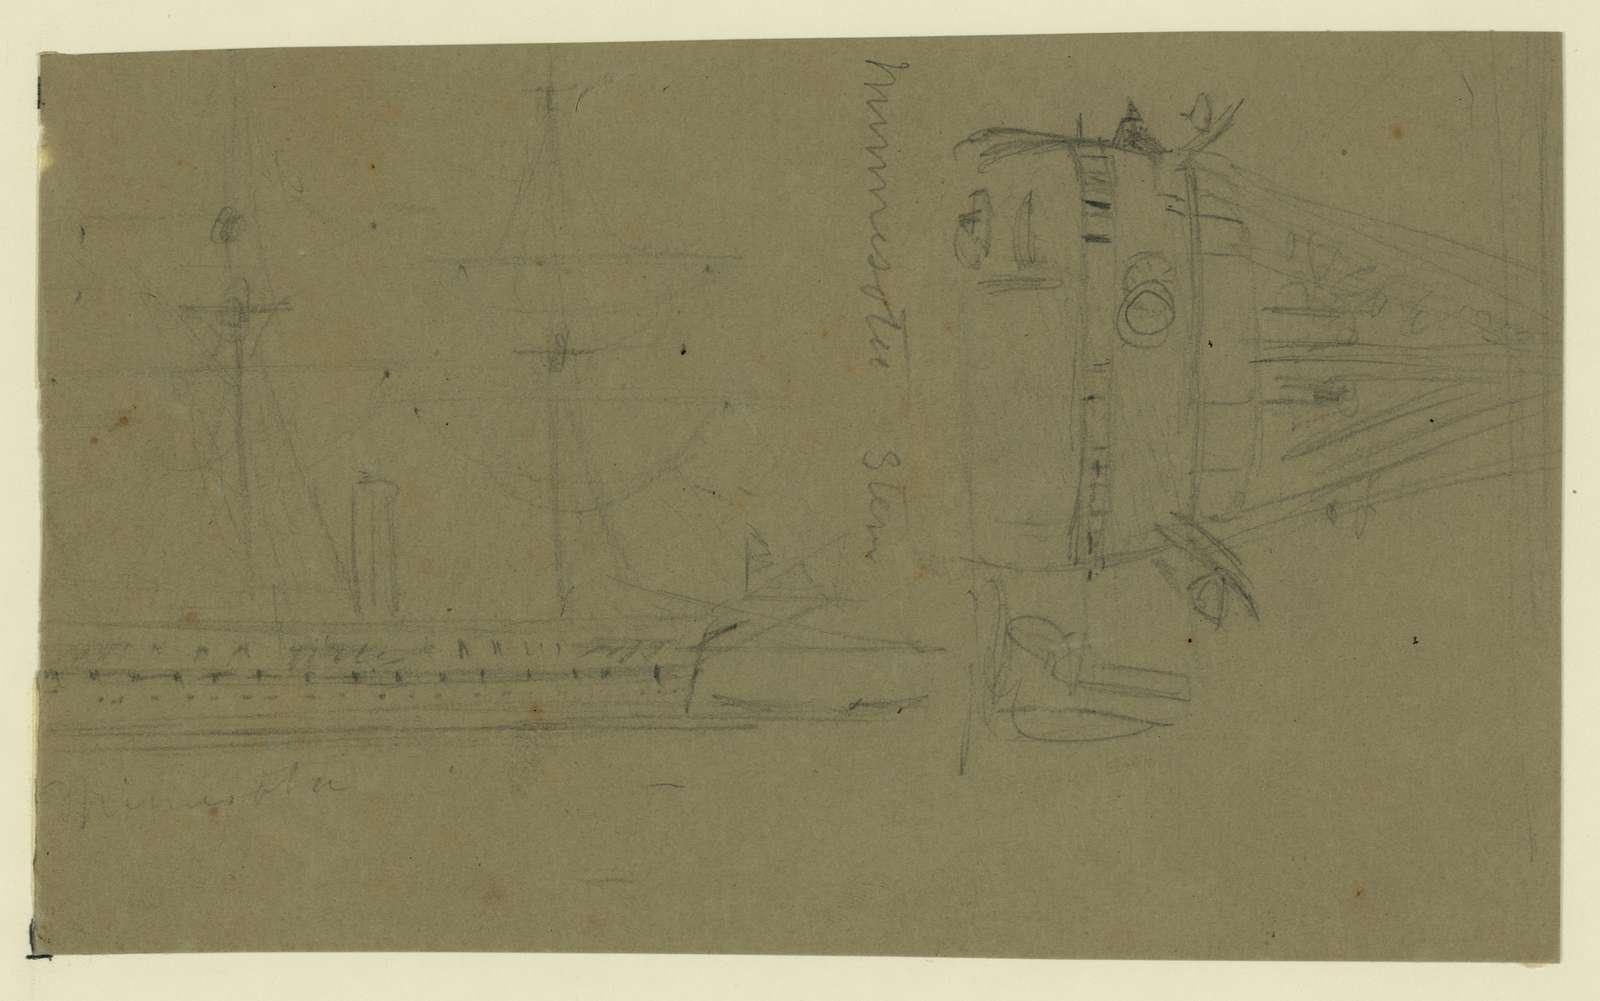 [Broadside and stern views of steamship Minnesota]